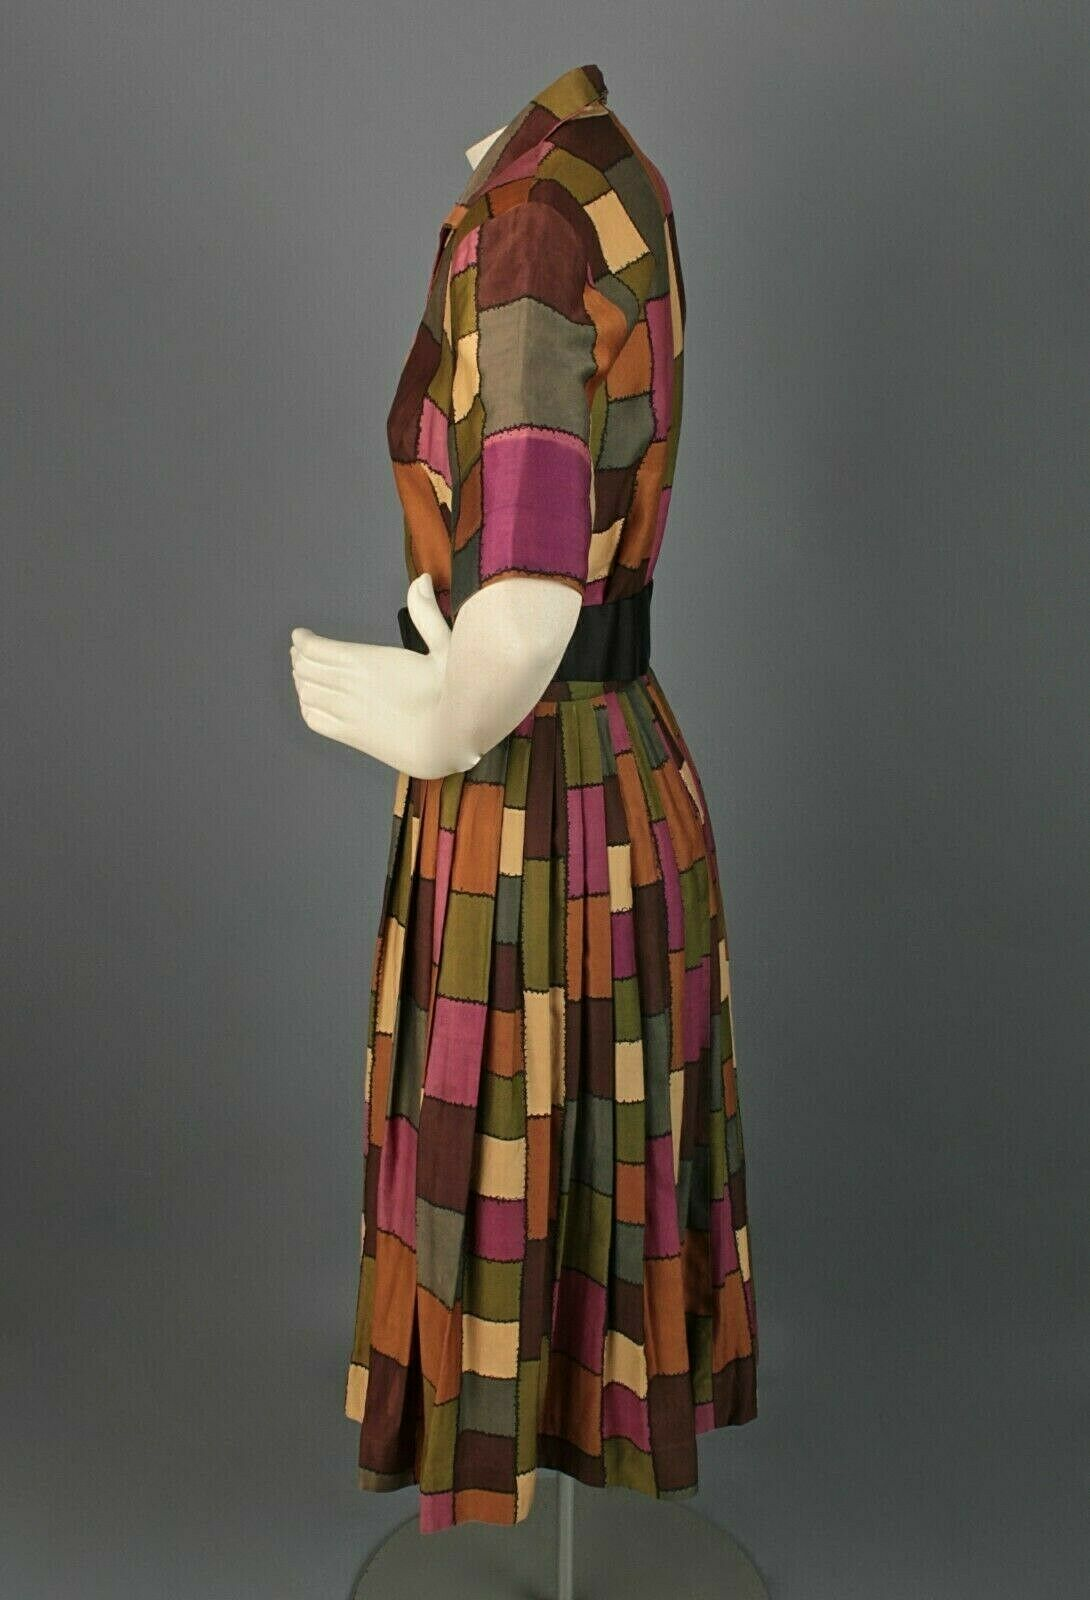 VTG Women's 50s 60s Patchwork Print Shirtwaist Dr… - image 2